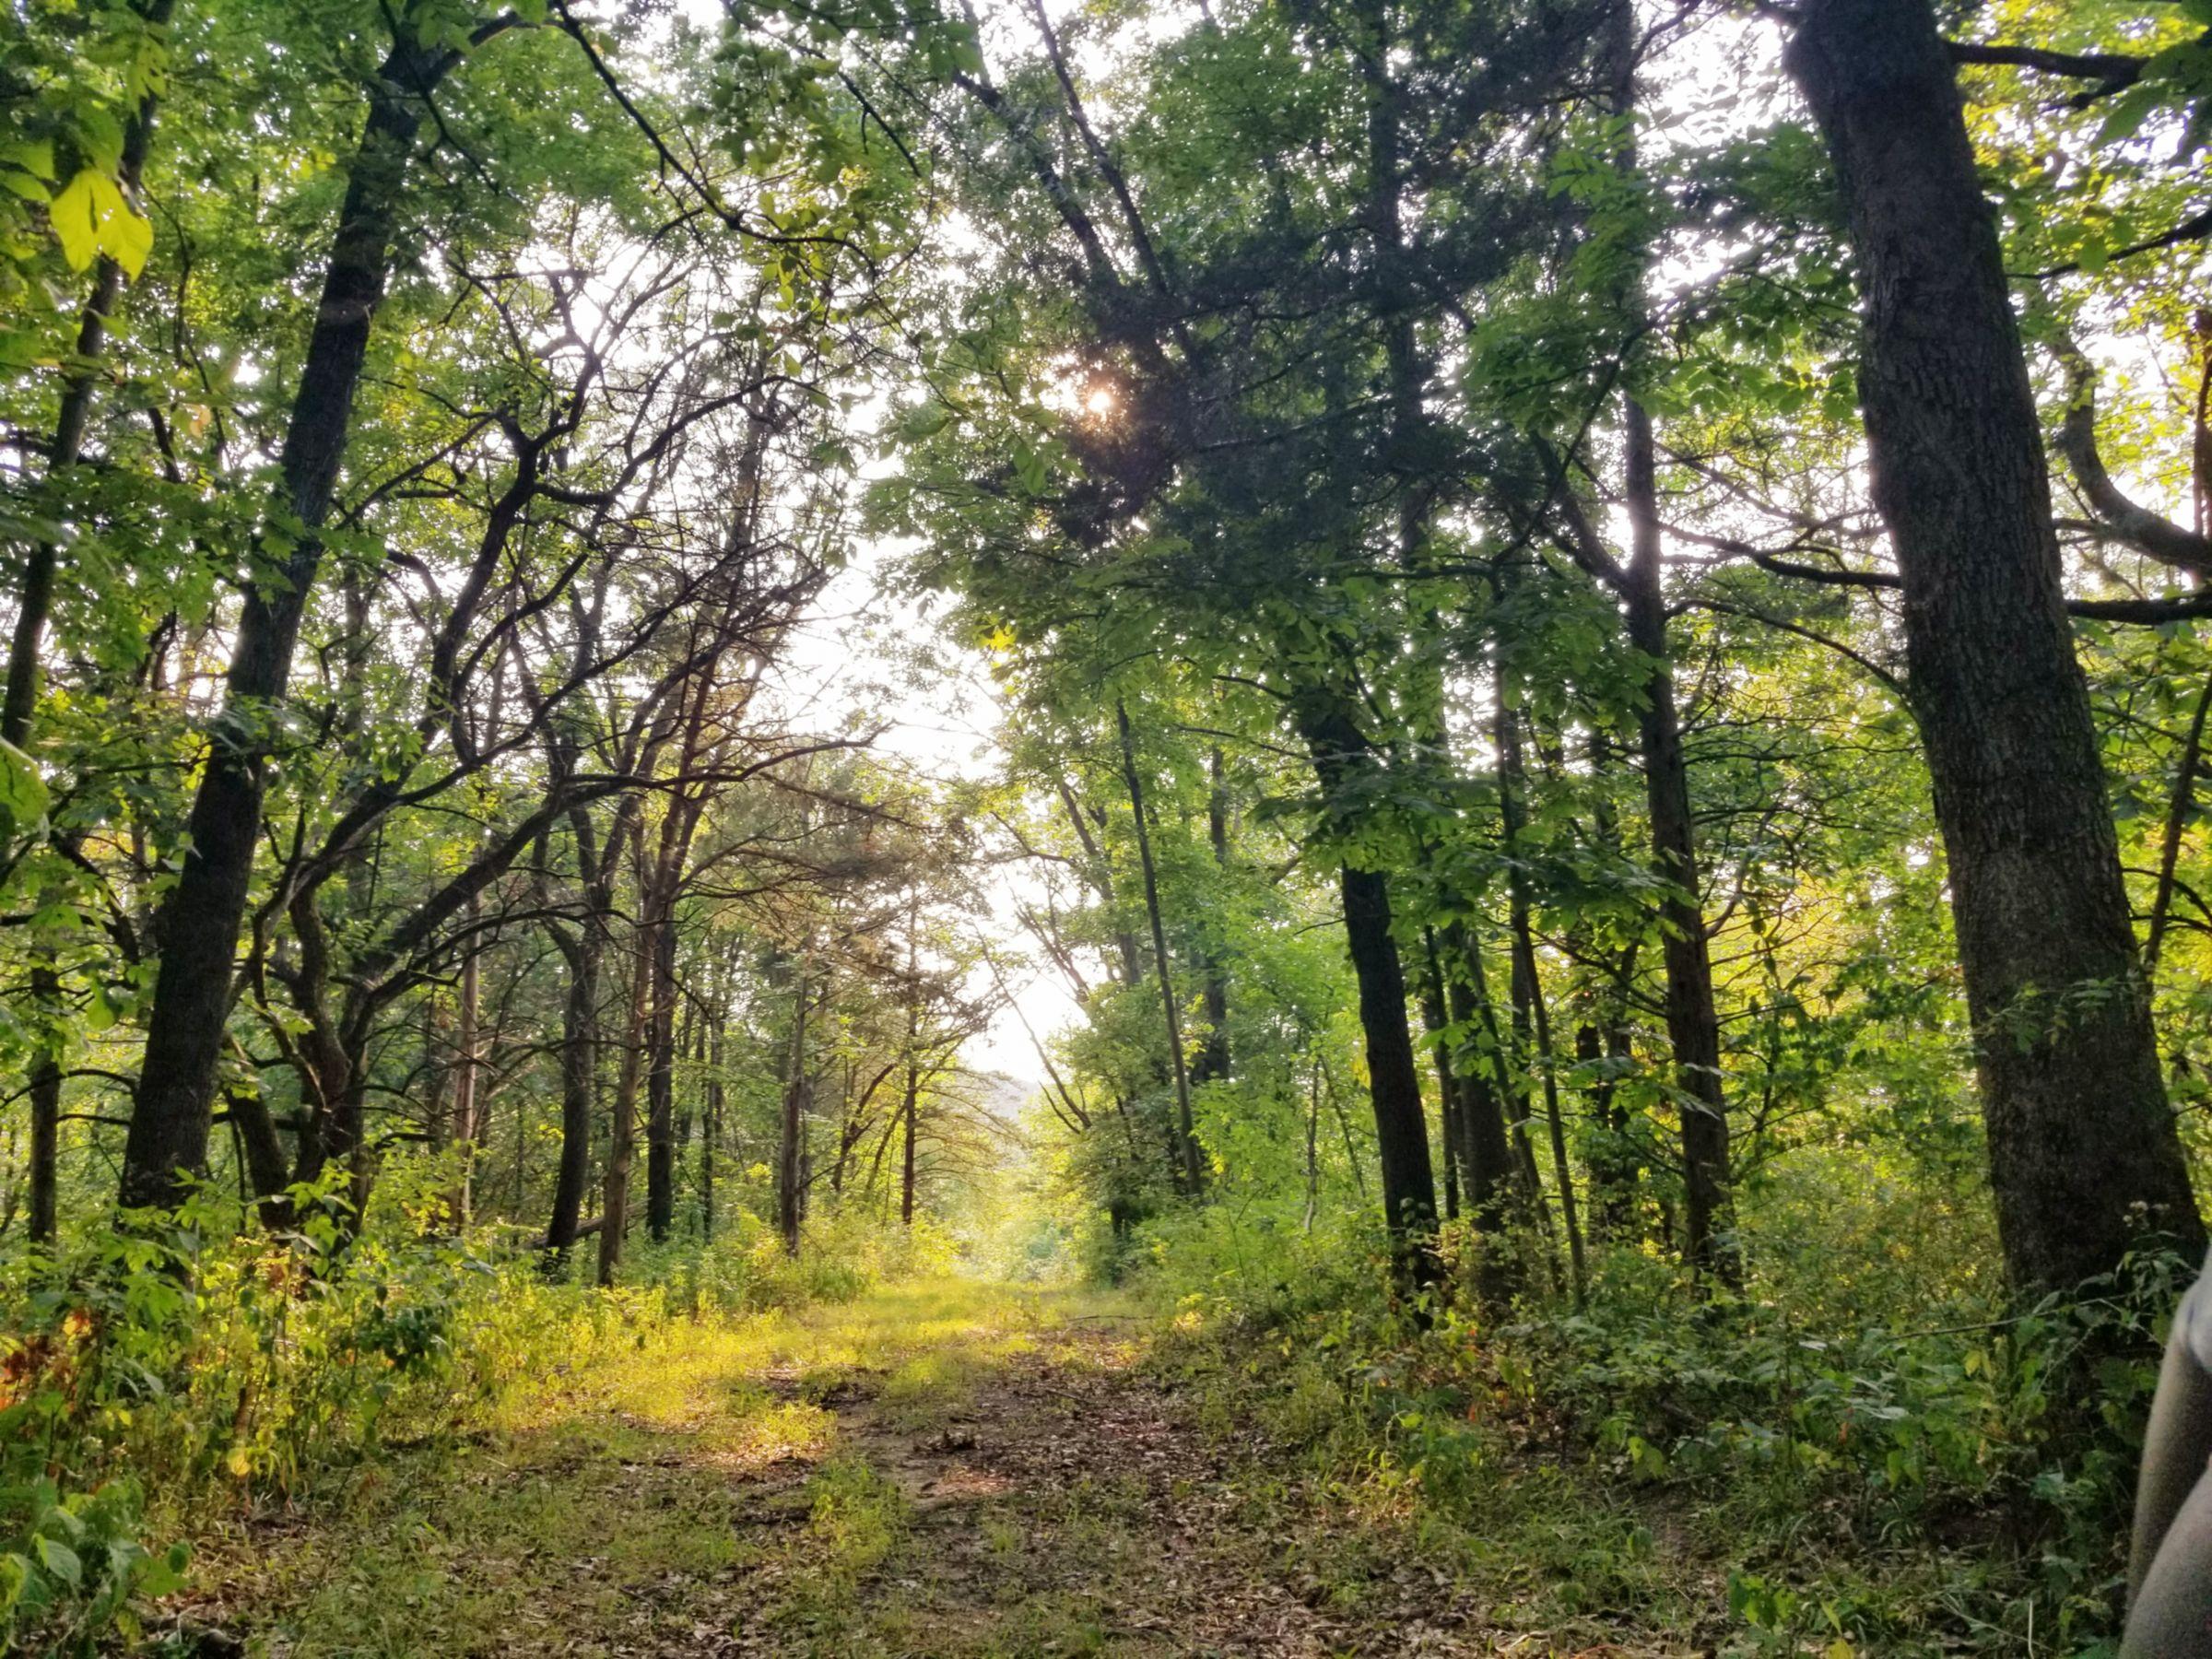 land-lee-county-iowa-328-acres-listing-number-15137-5-2020-08-27-174857.jpg